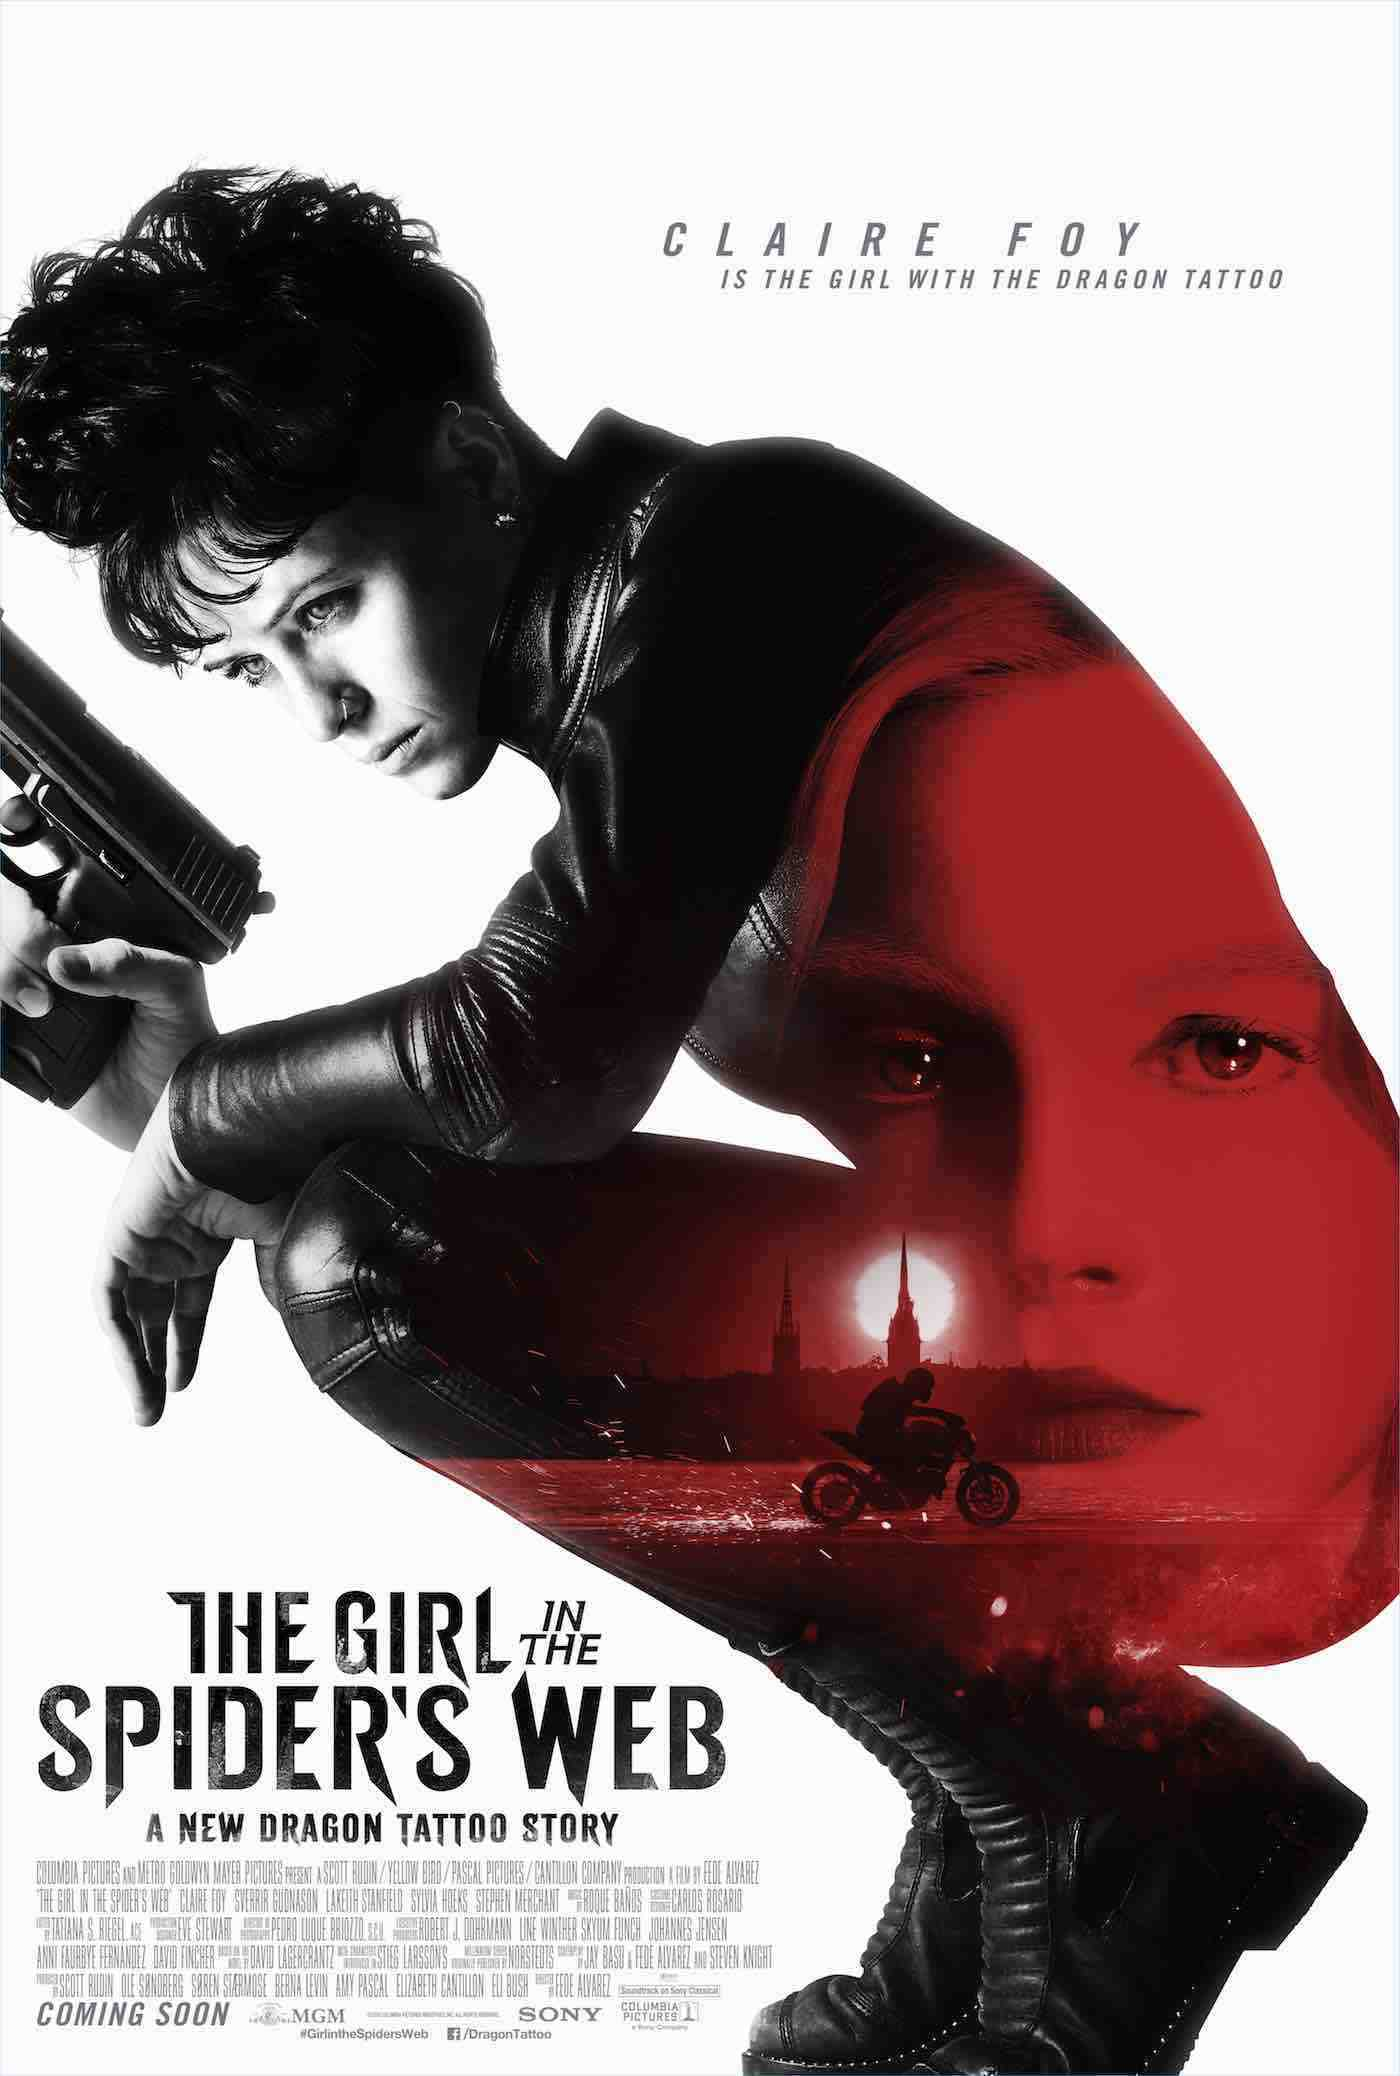 Verschwörung Film Trailer & Poster 2